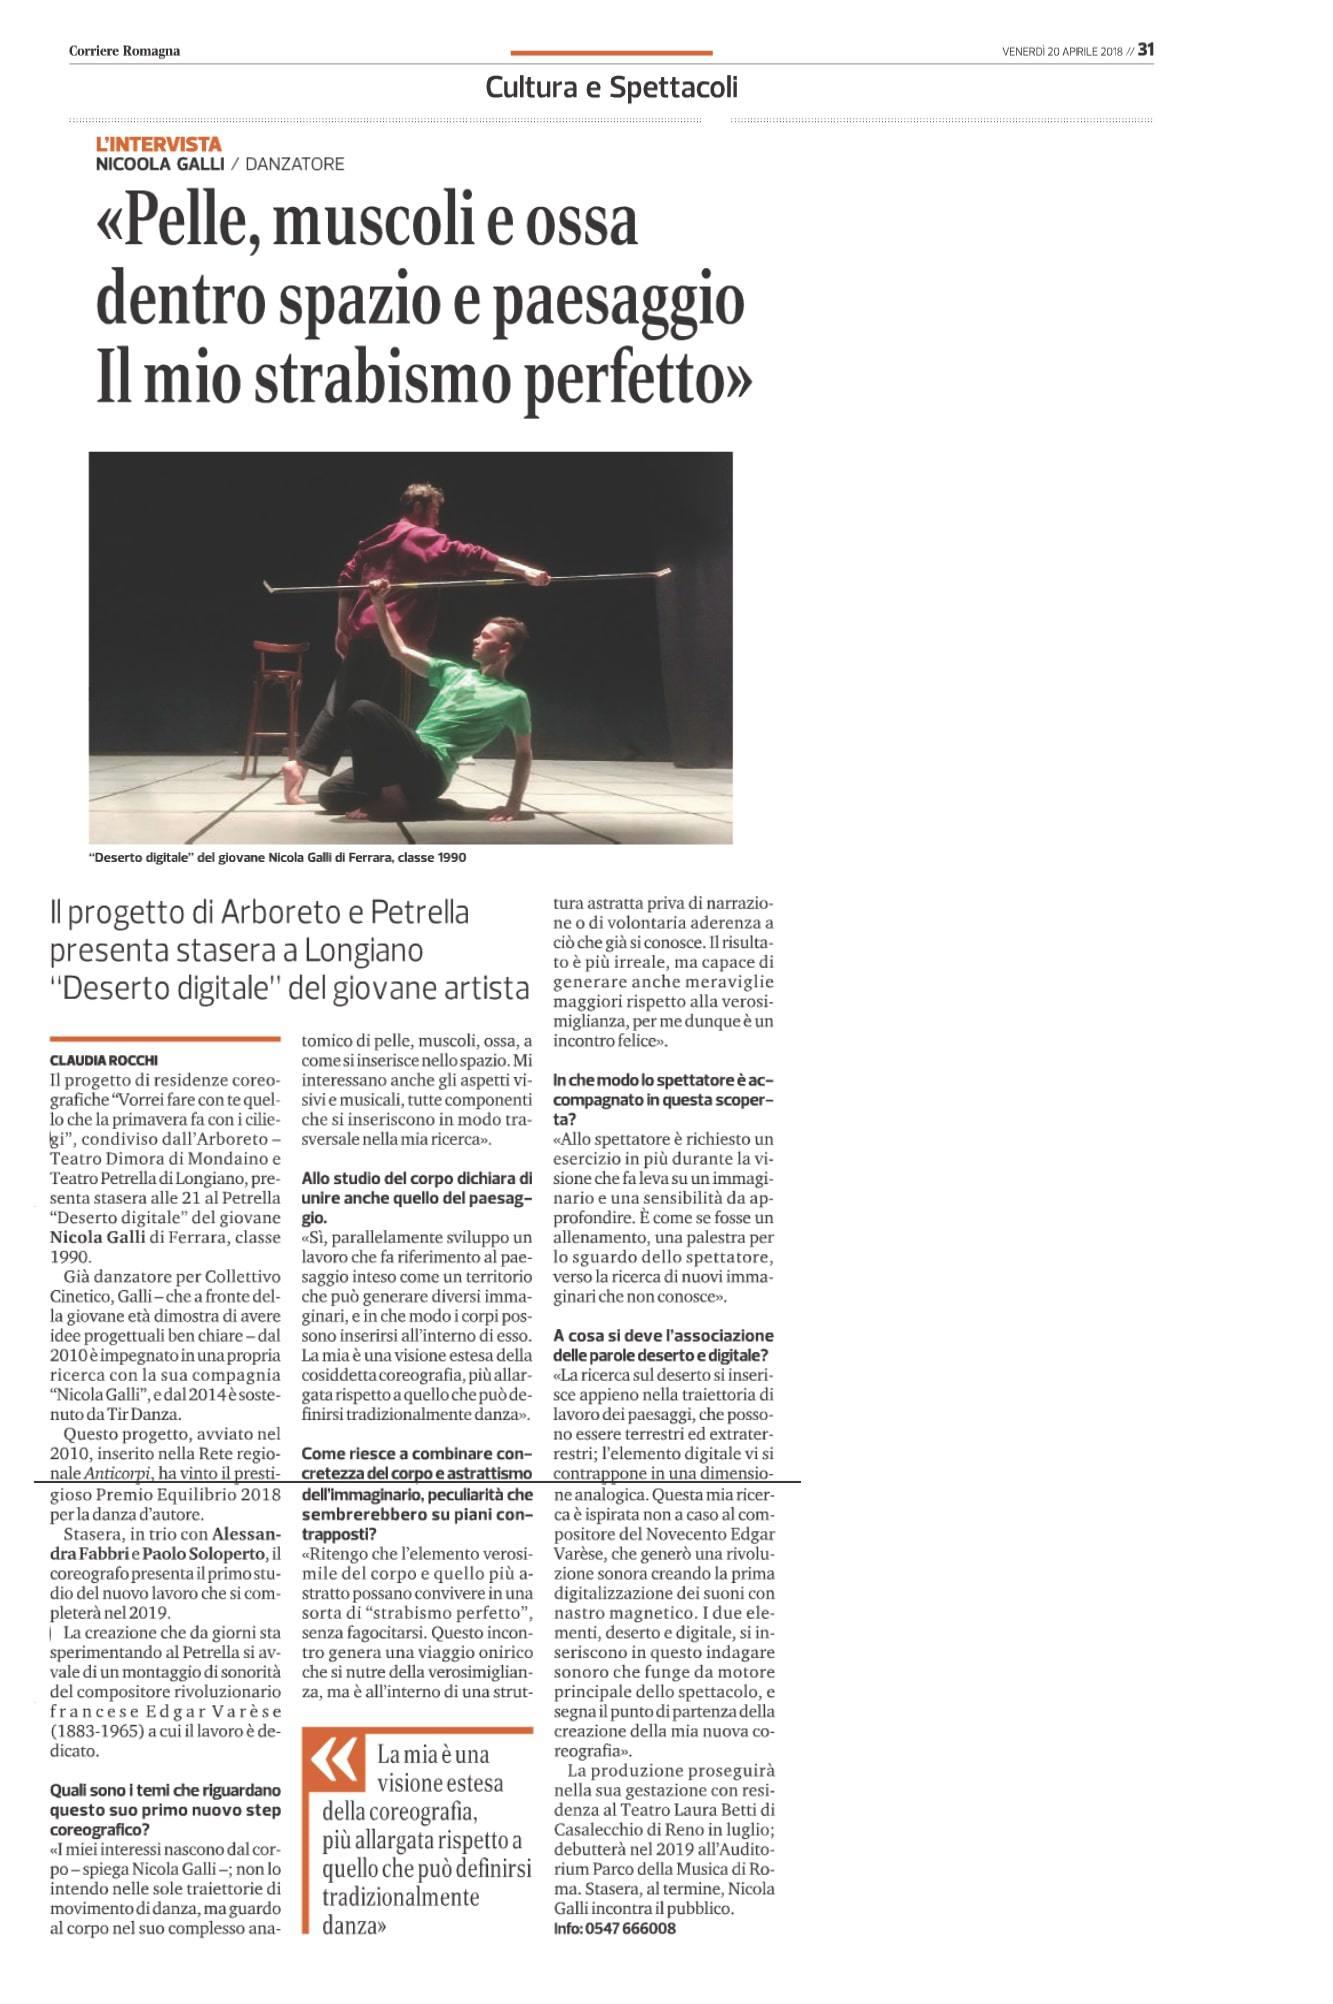 Intervista / Nicola Galli / Deserto digitale / Corriere Romagna / 2018